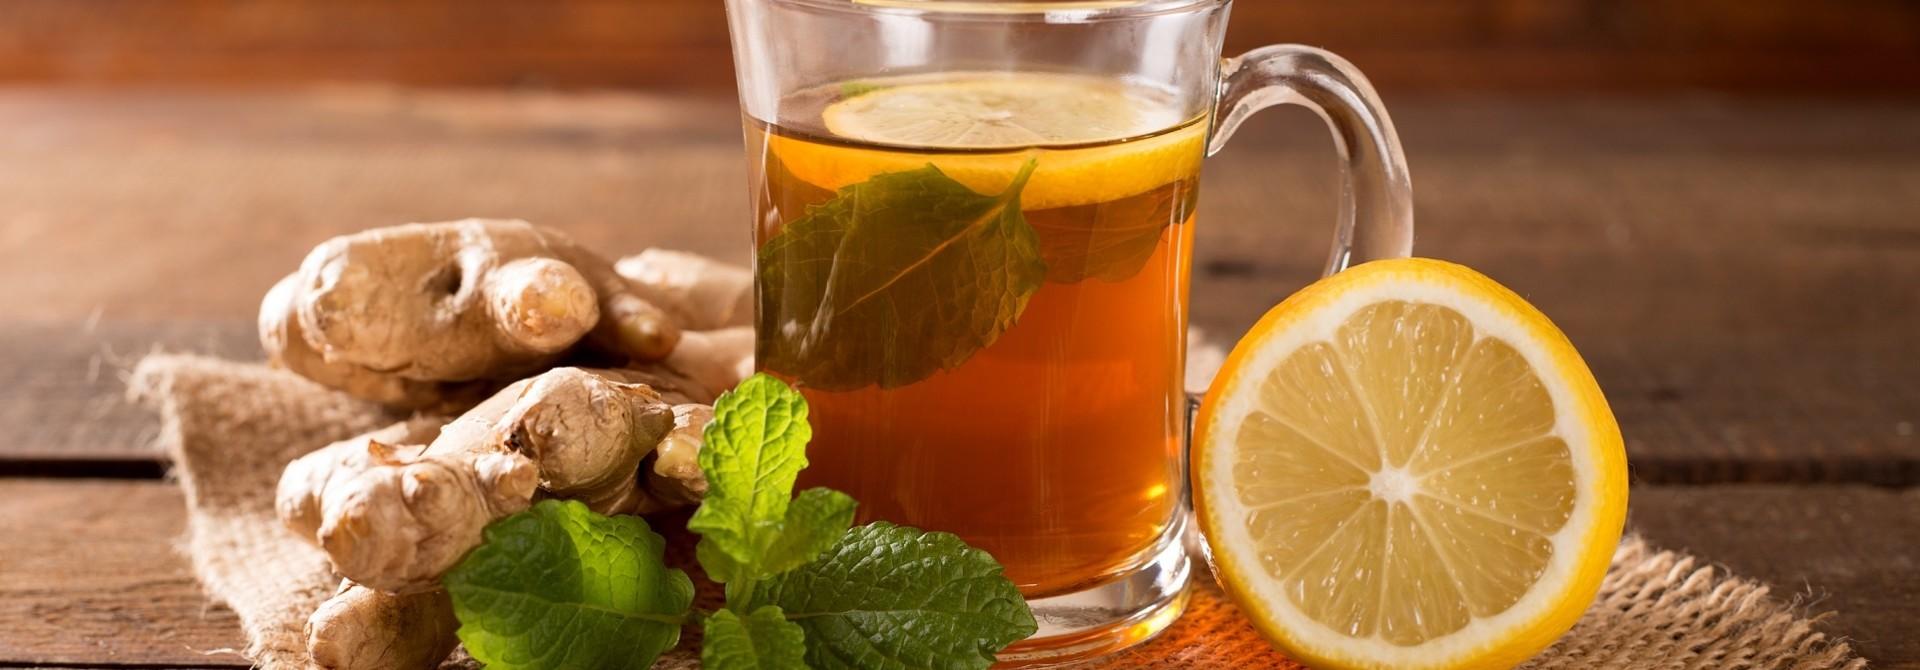 Schwarzer Tee aromatisiert